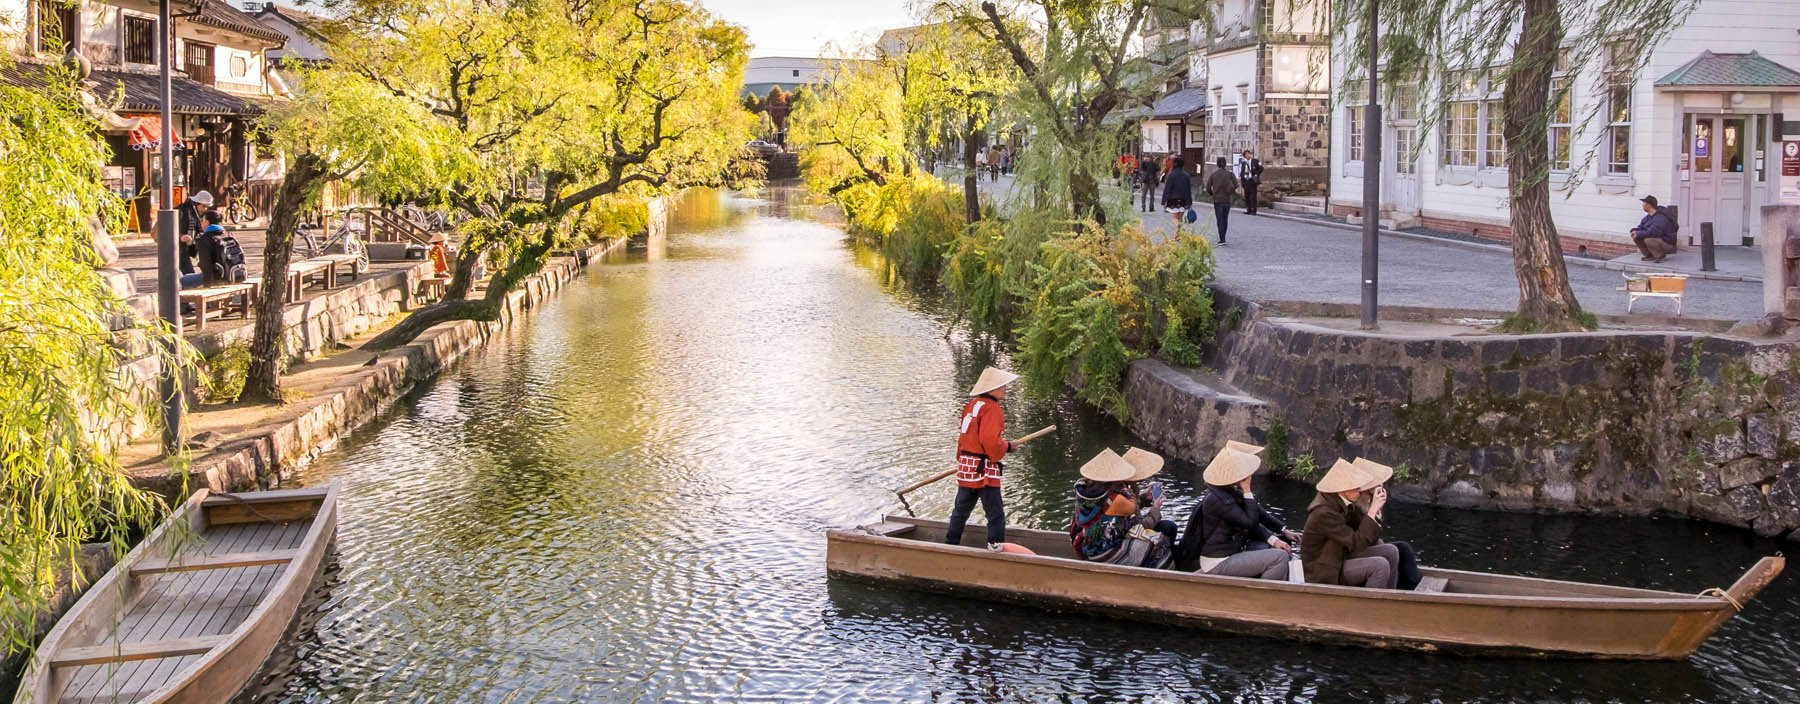 jp, kurashiki, rivier kurashiki historisch centrum.jpg